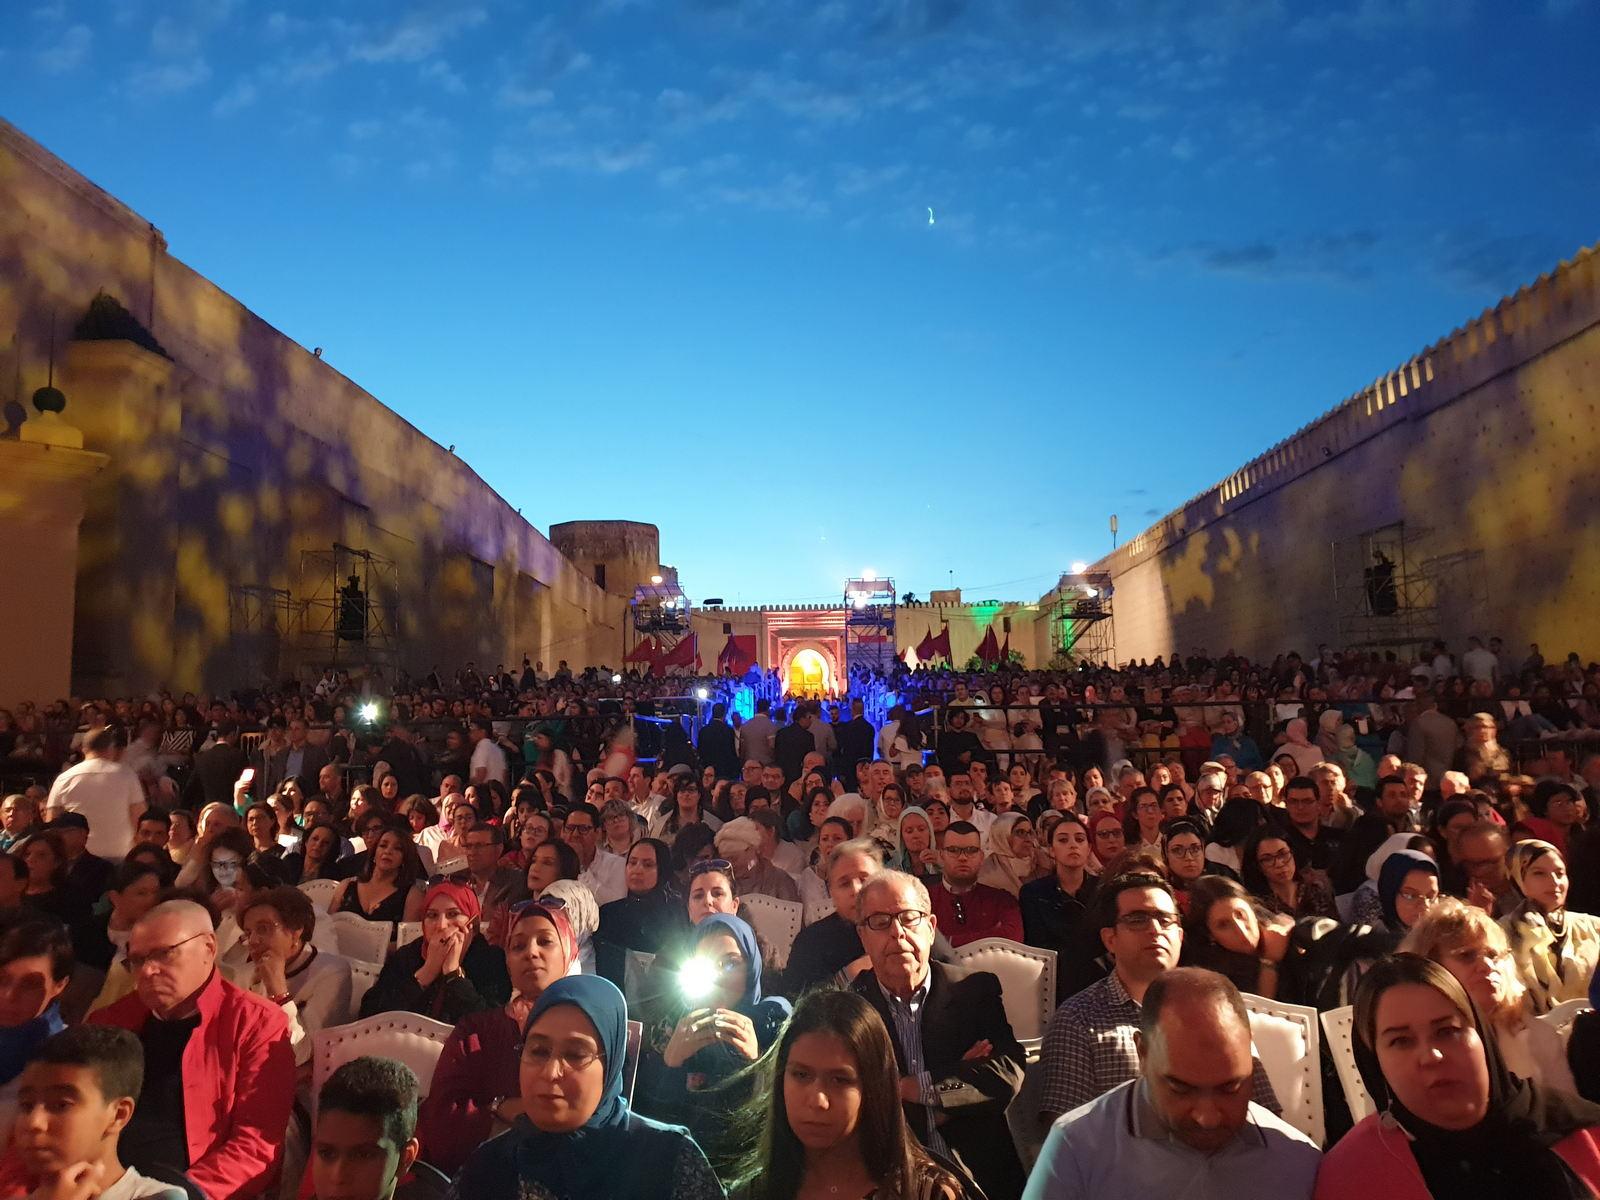 Festival de Fez de Música Sagrada • Marrocos 2